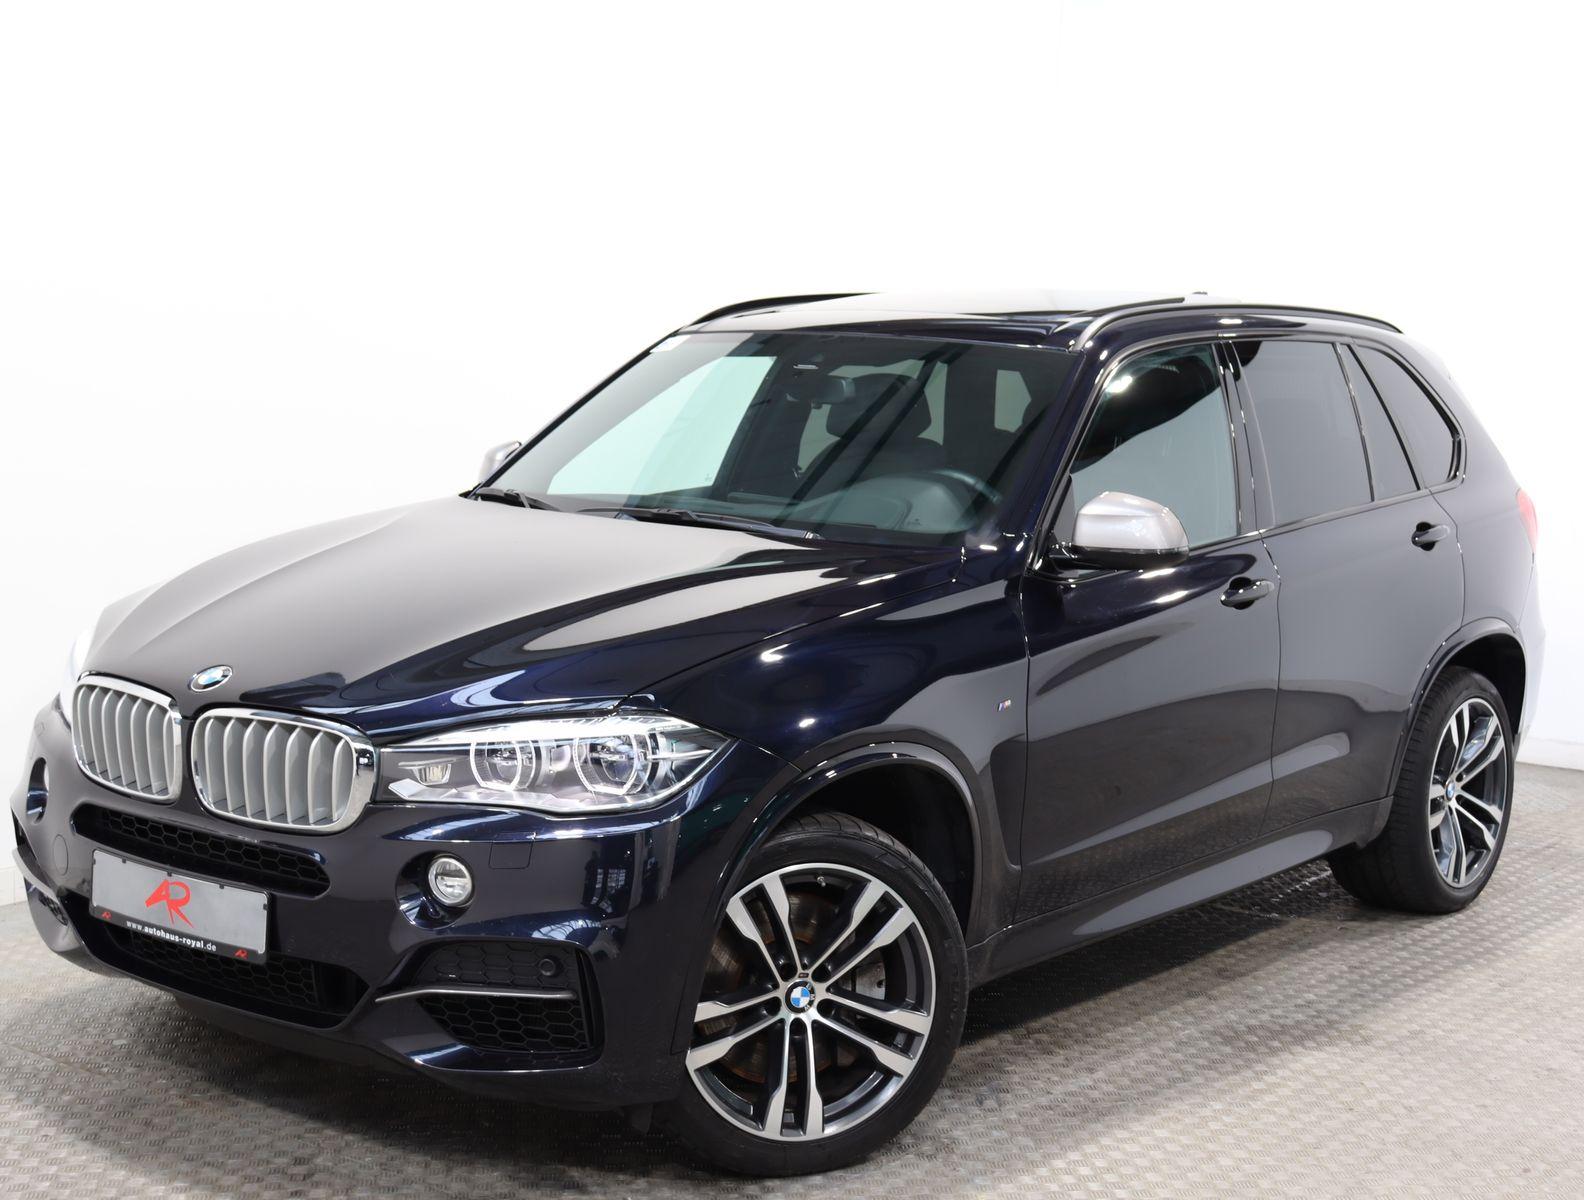 BMW X5 M50 d SAG STANDHEIZUNG,MEMORY,HEAD-UP,H/K,LED, Jahr 2015, Diesel